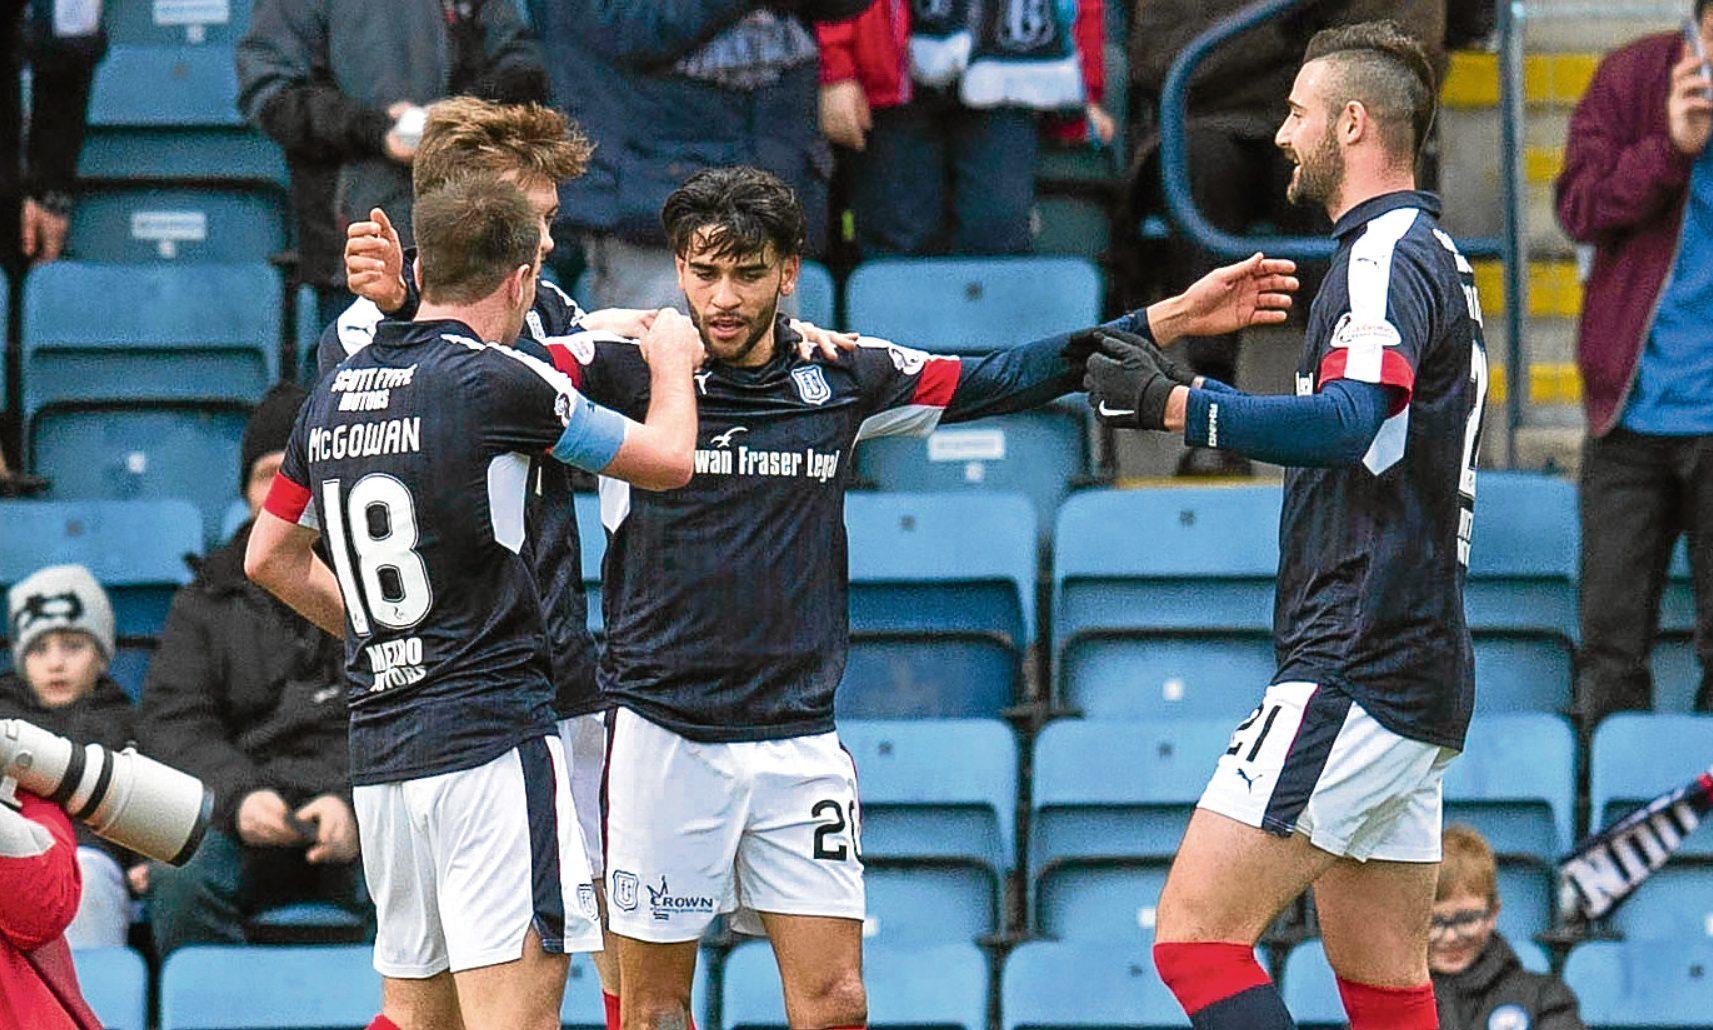 Faissal El Bakhtaoui celebrates opening the scoring against St Johnstone with team-mates Paul McGowan, Craig Wighton and Marcus Haber.